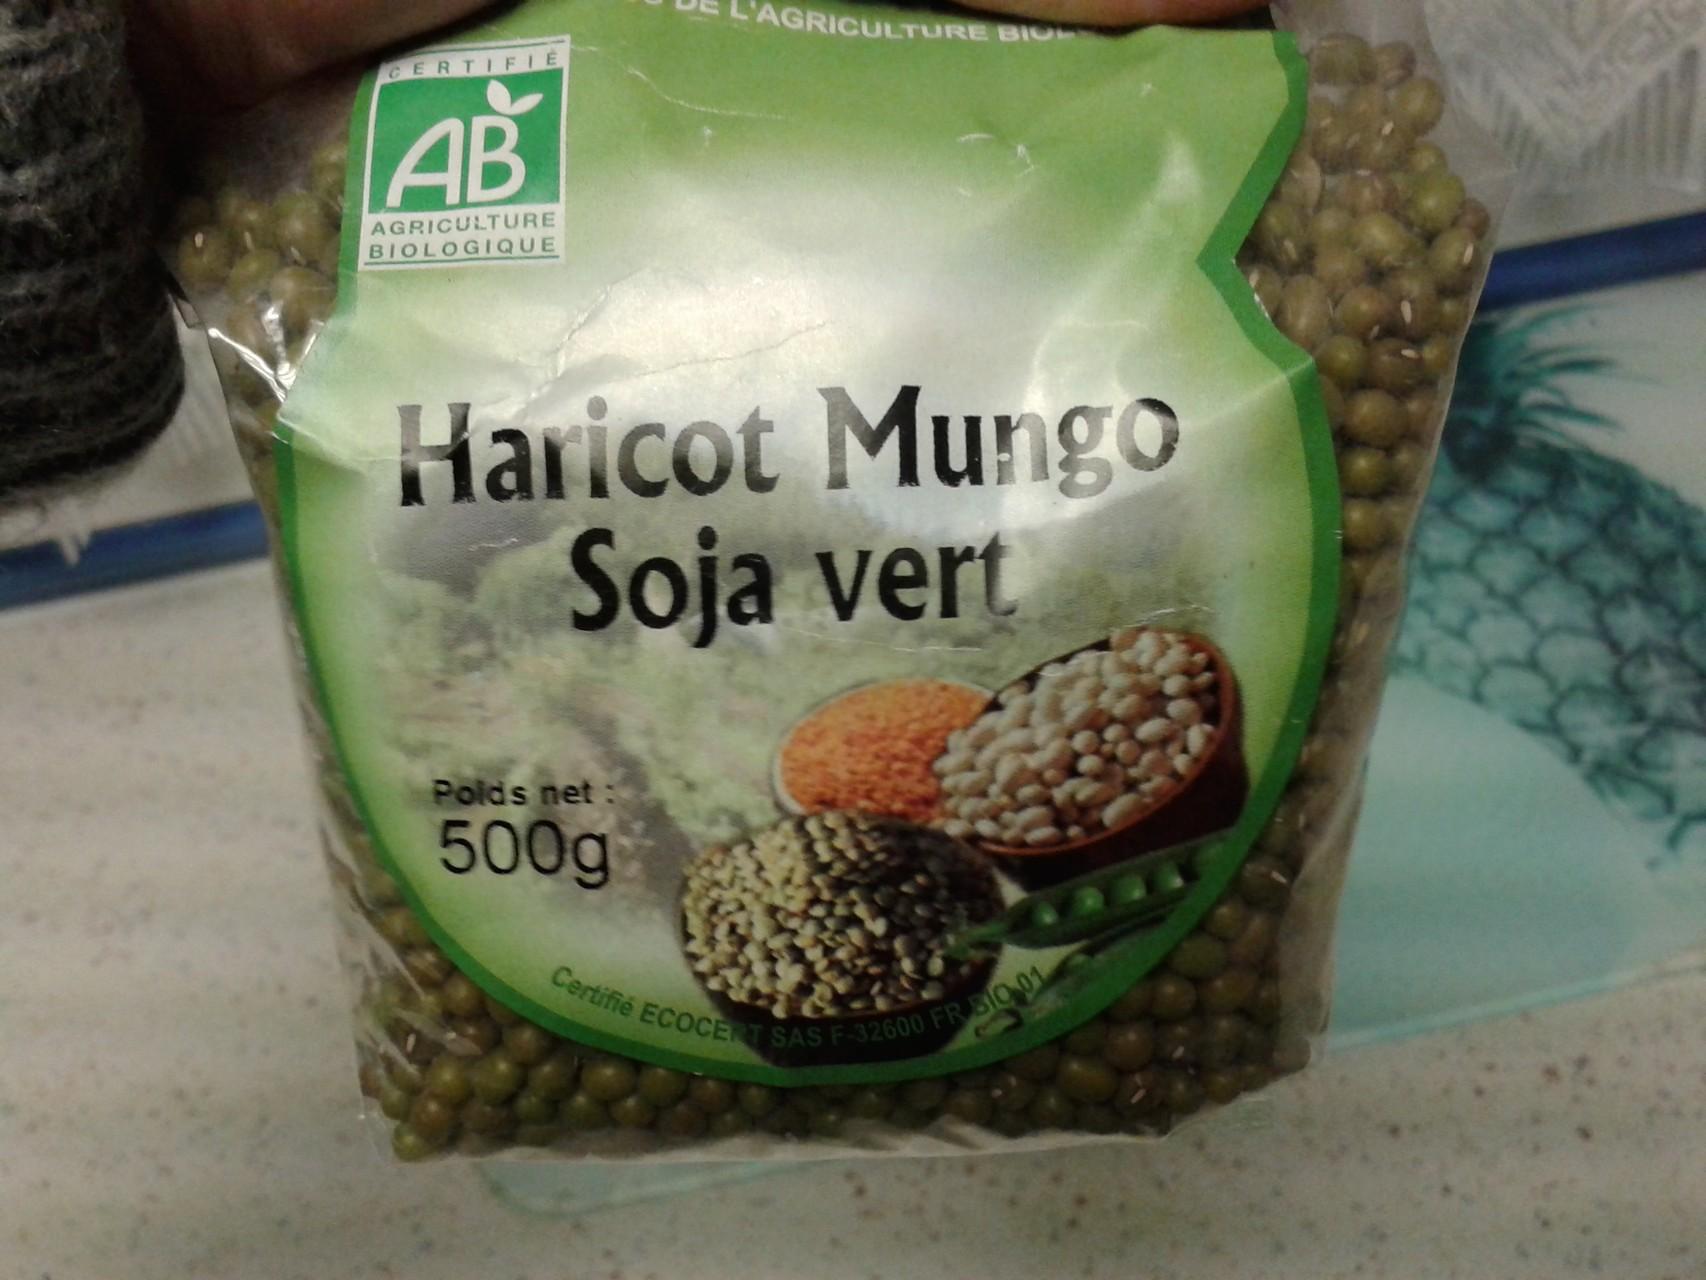 haricots mungo = germes de soja